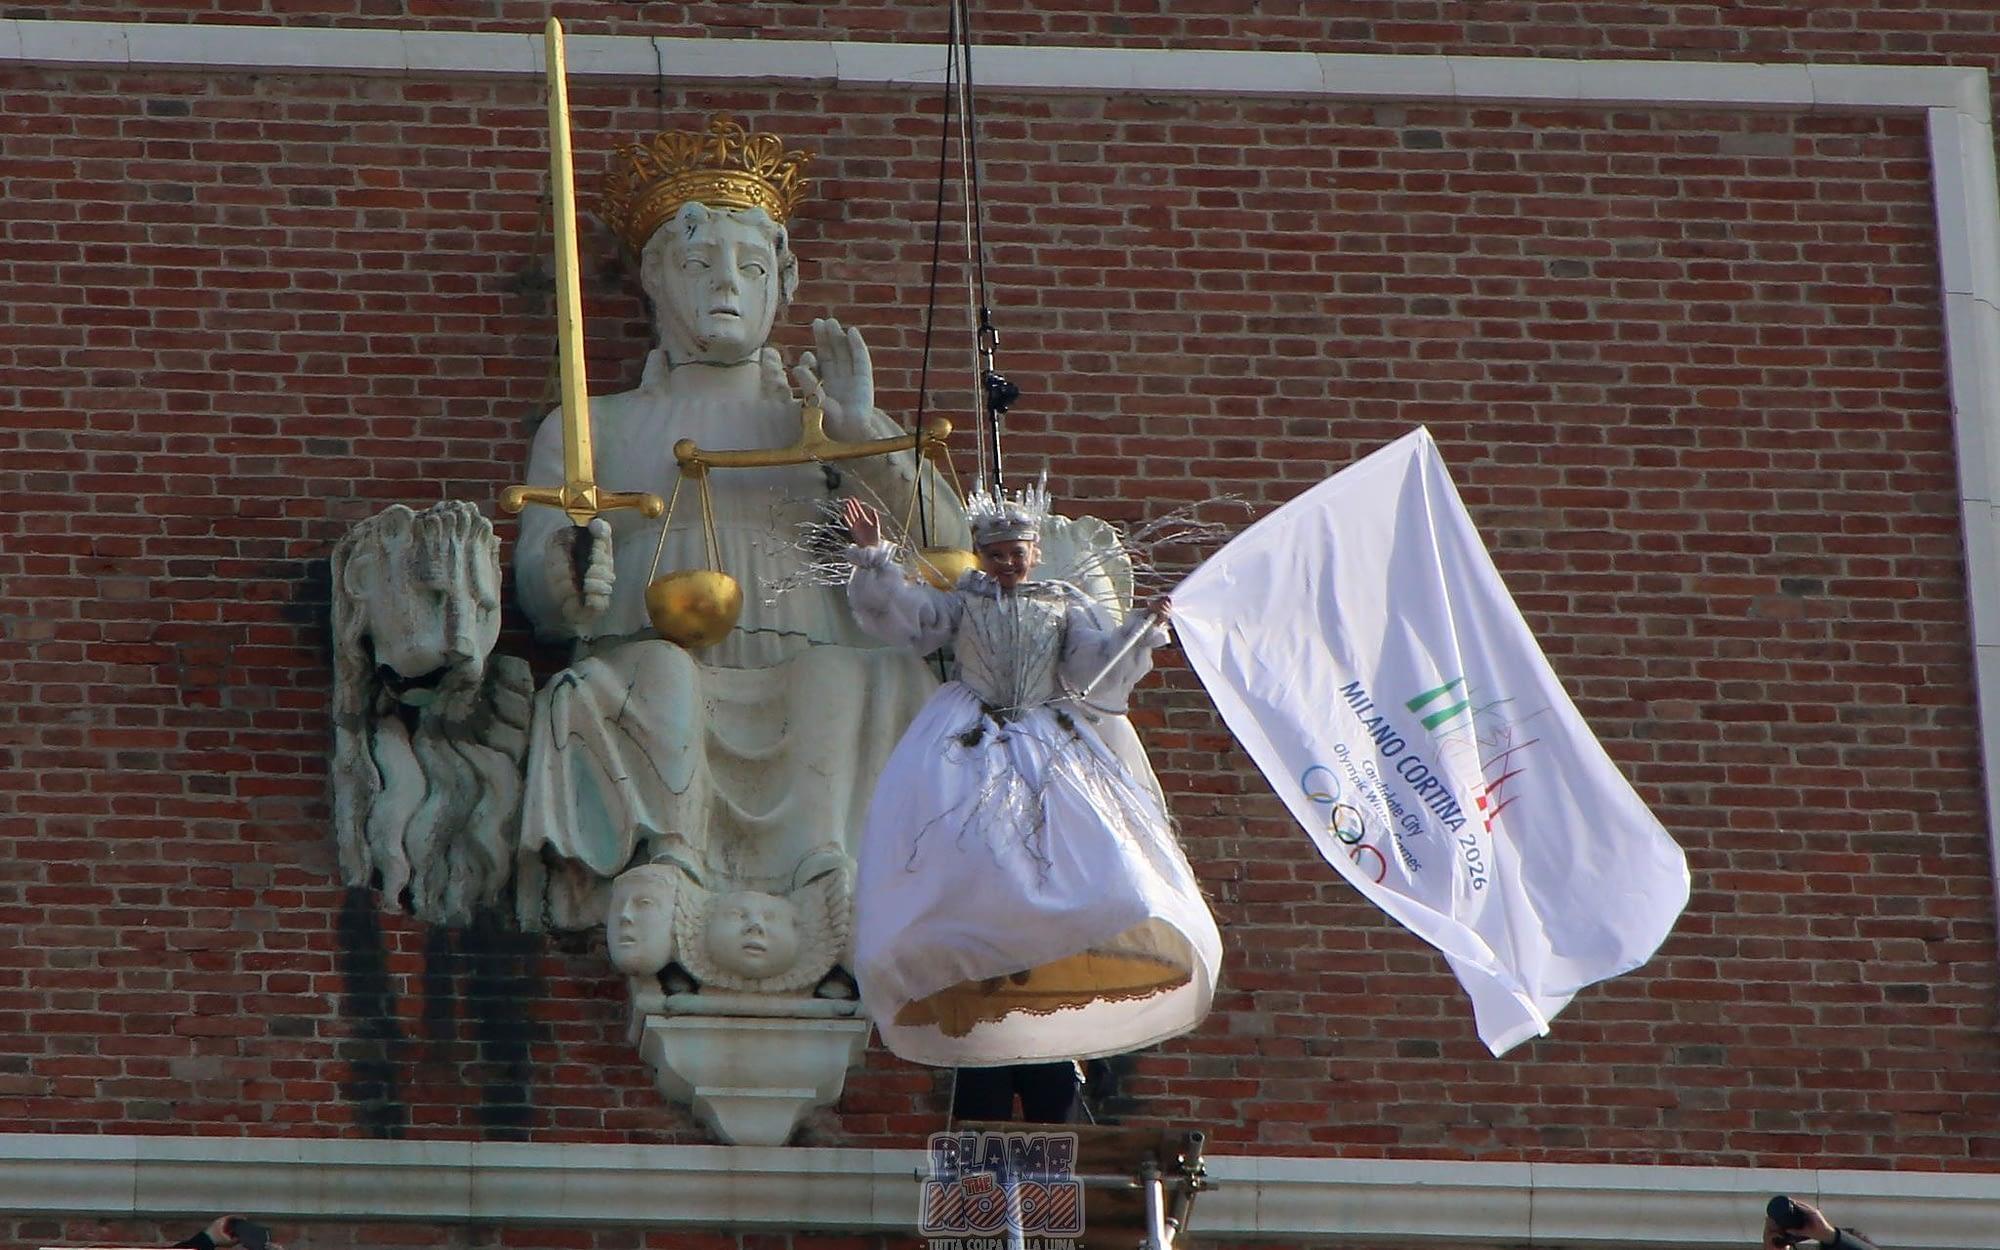 Venice Carnival Flight of the Eagle over St Mark's Square